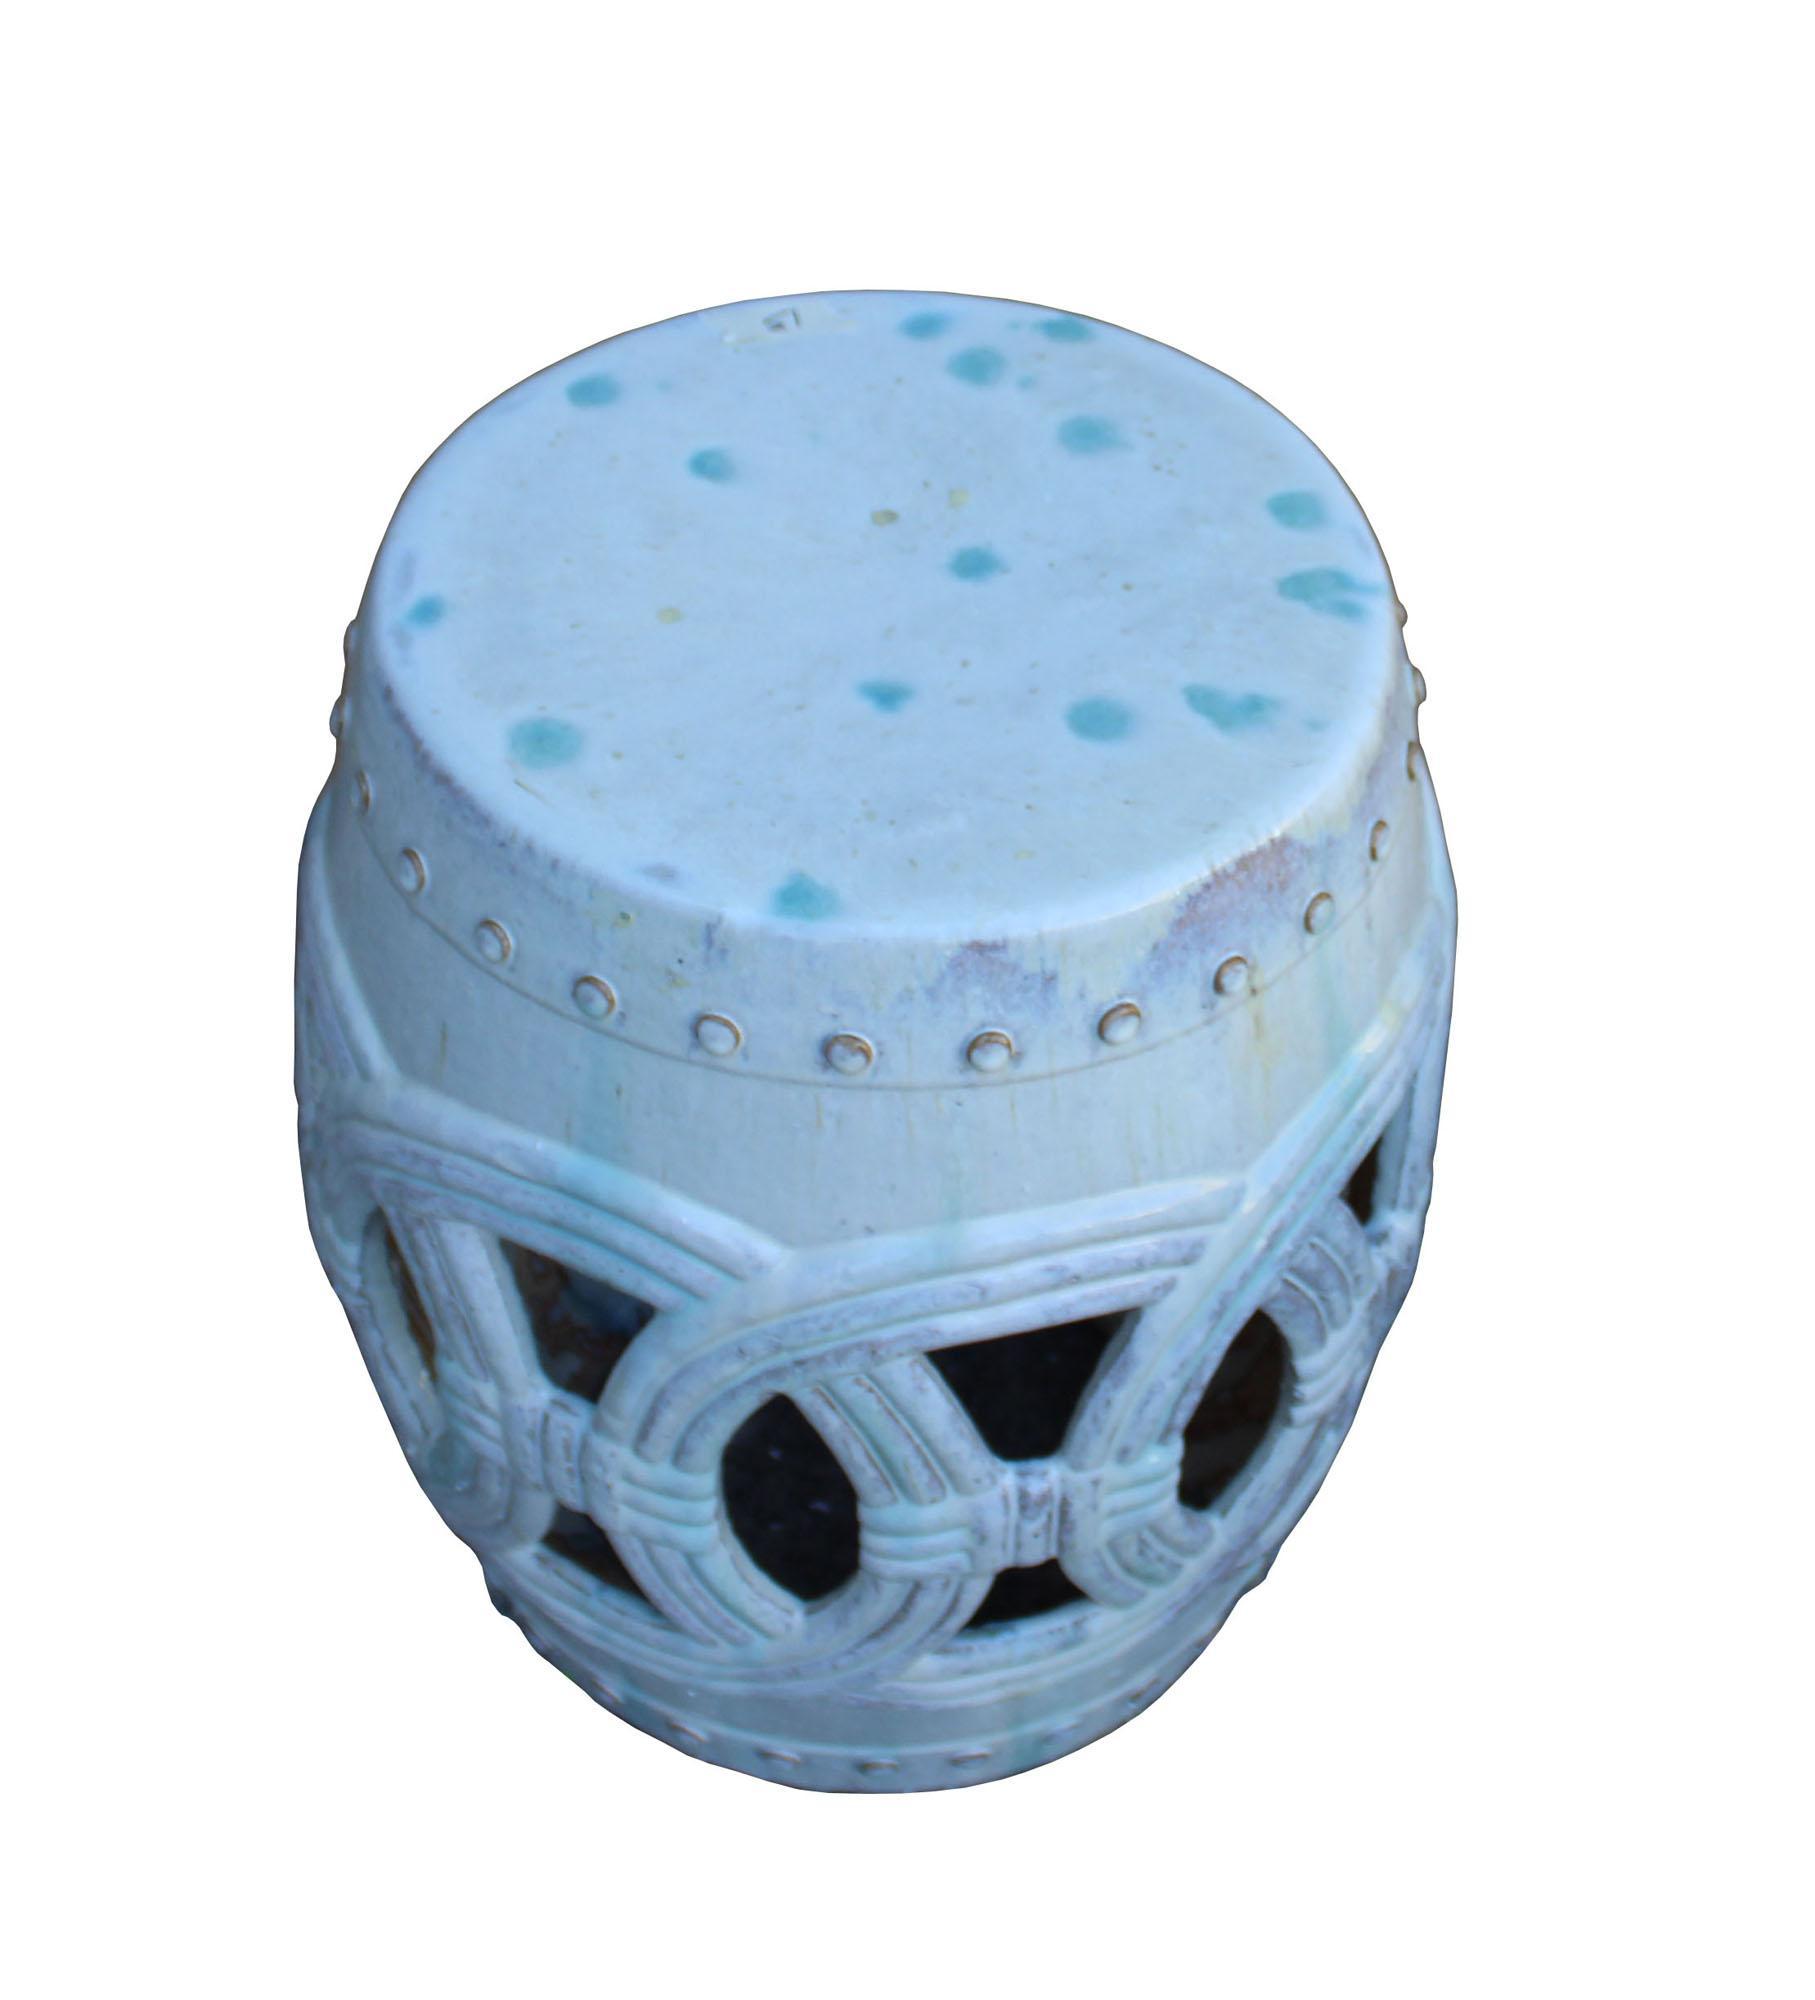 Chinese White Coin Pattern Round Clay Ceramic Garden Stool cs3299E